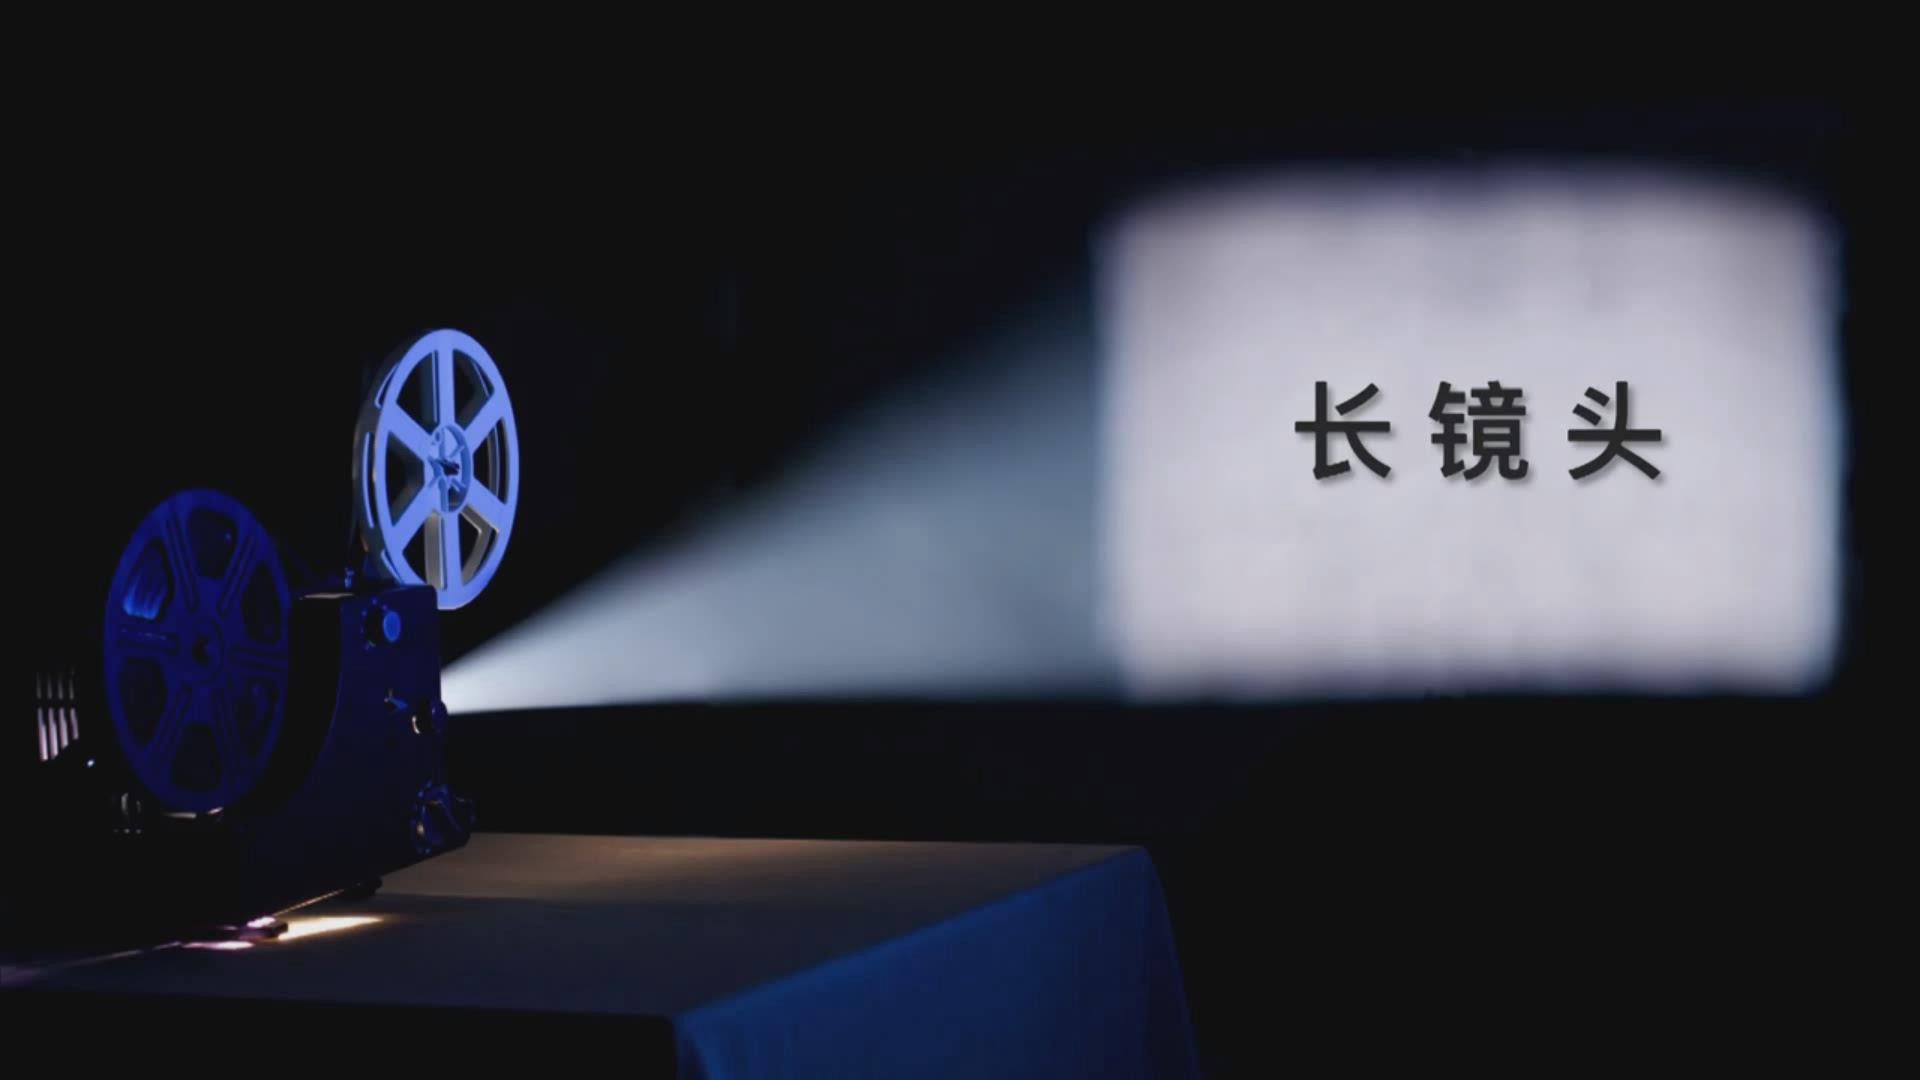 [FCPX 教程] 电影短视频影视实战剪辑中文教程